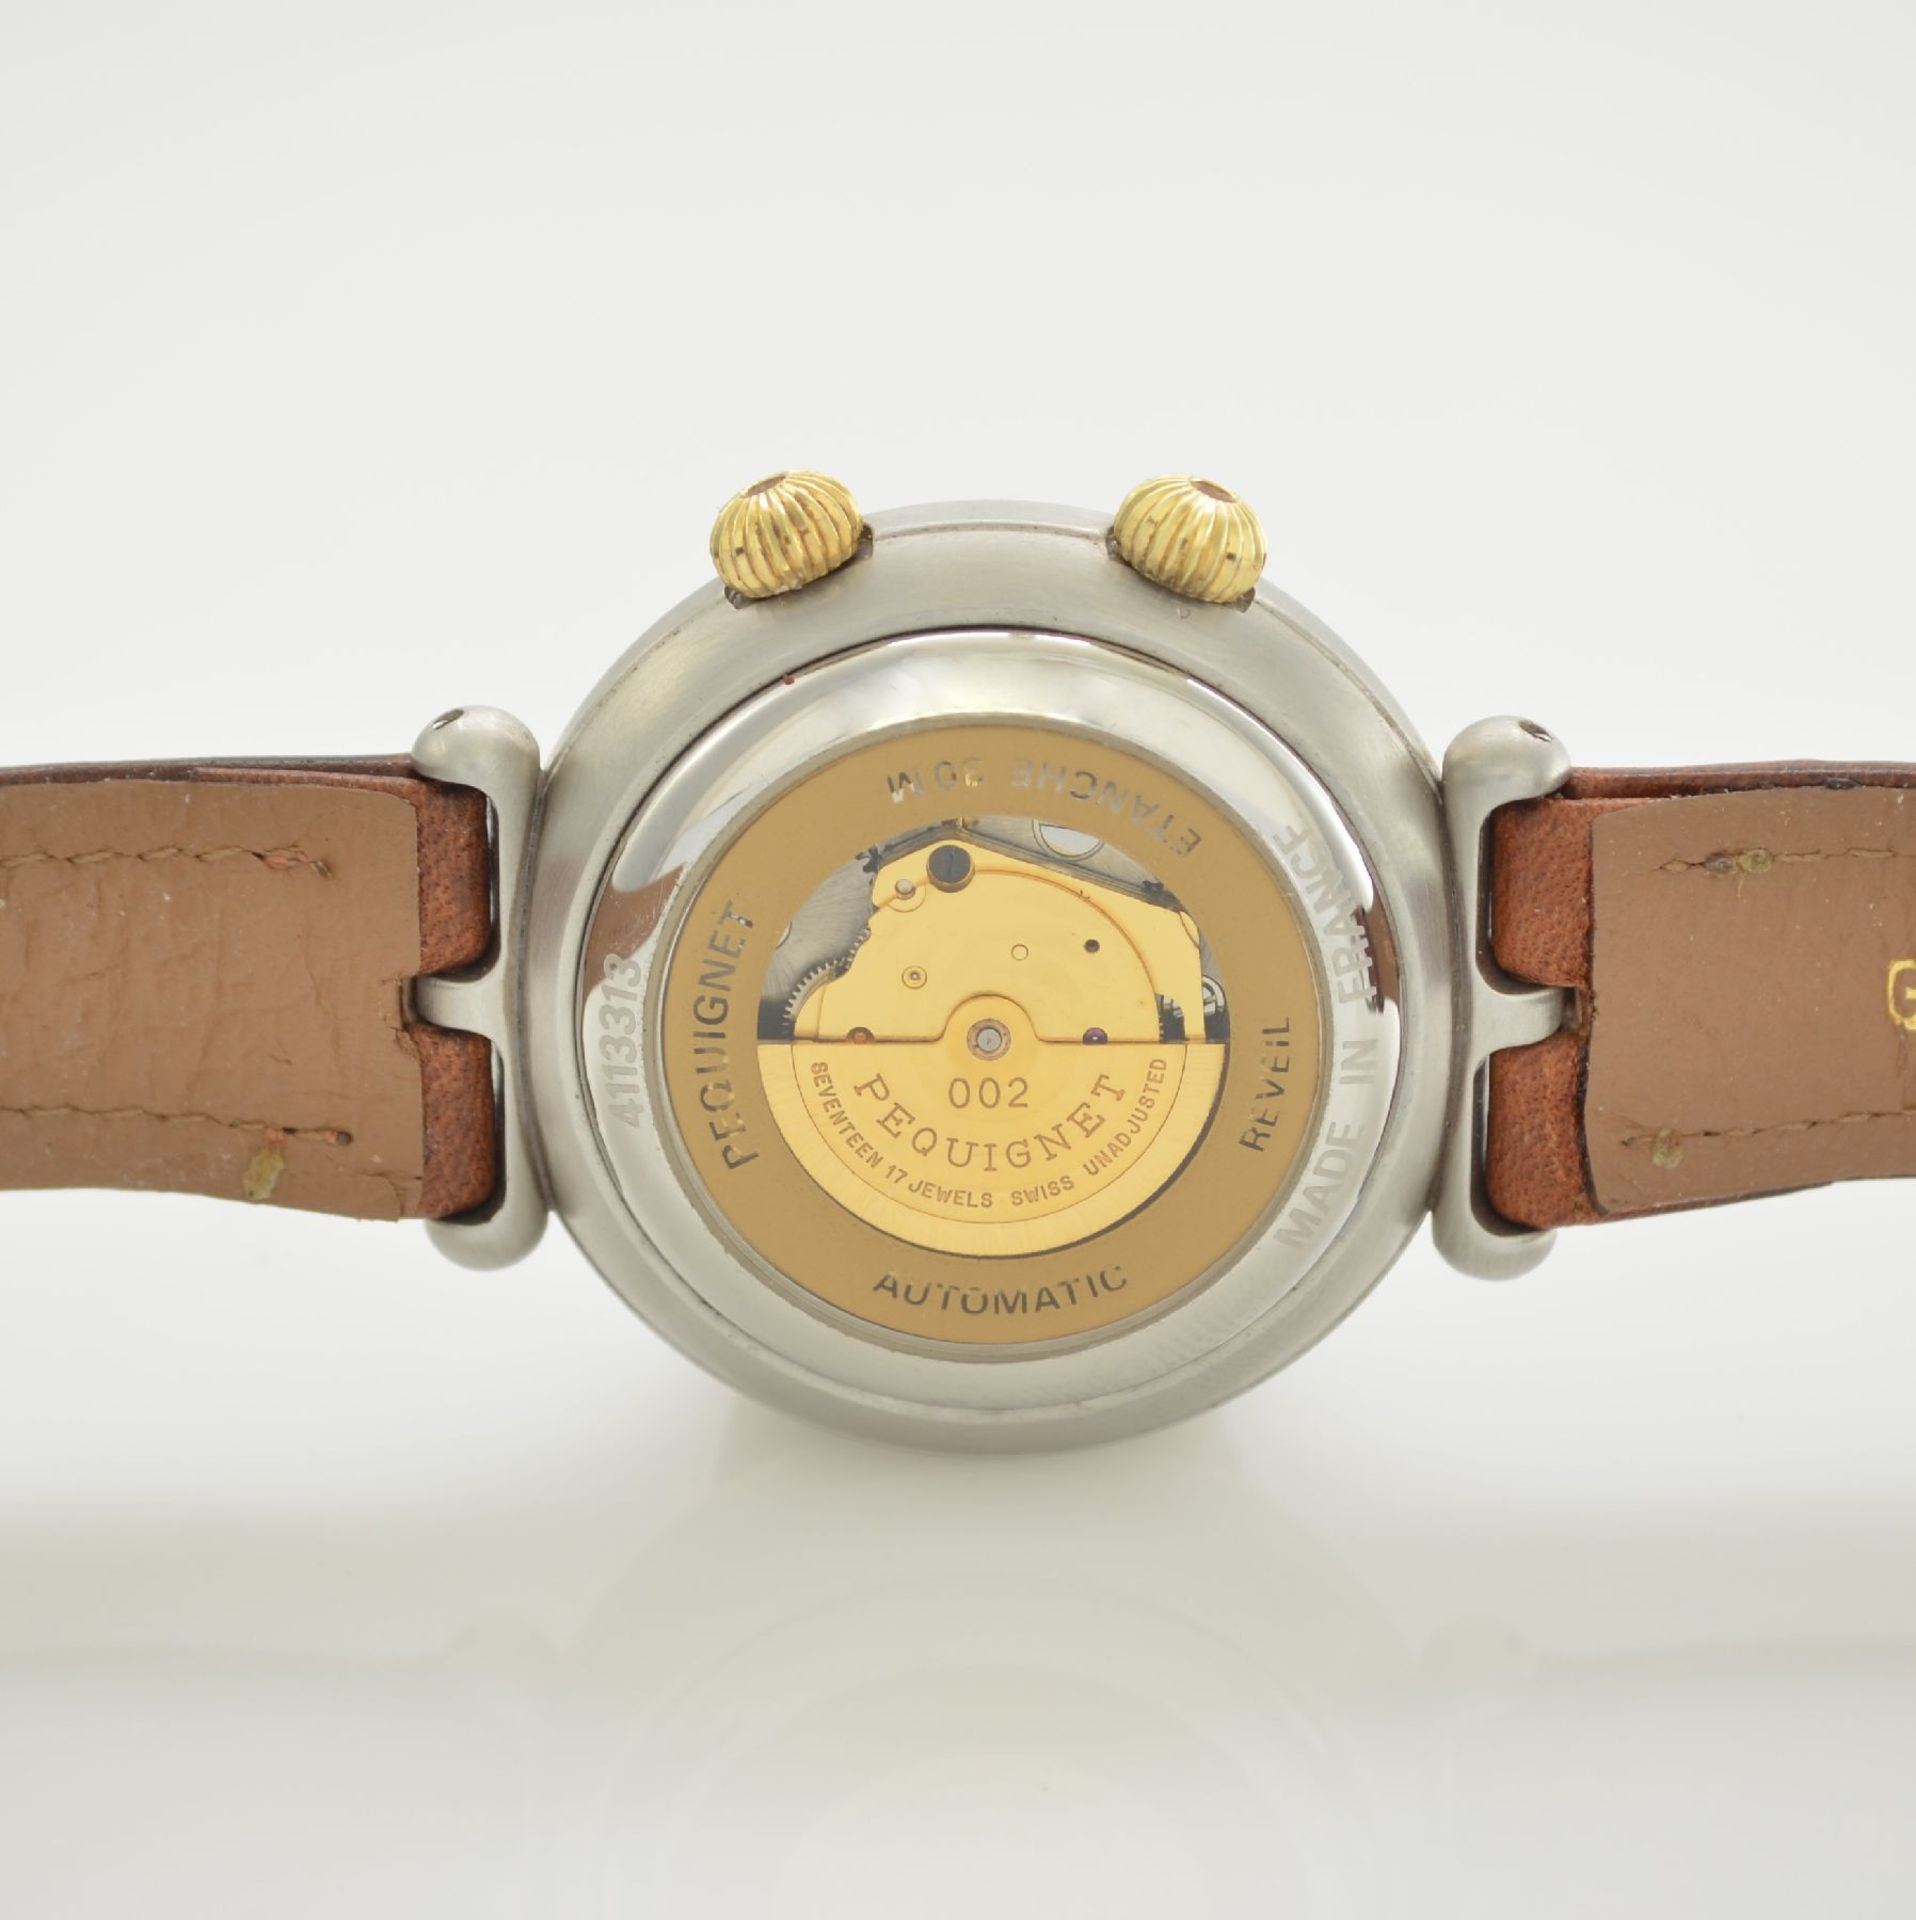 BUCHERER Chronometer Herrenarmbanduhr Archimedes in Edelstahl, Automatik, Gliederband m. dopp. - Bild 6 aus 7